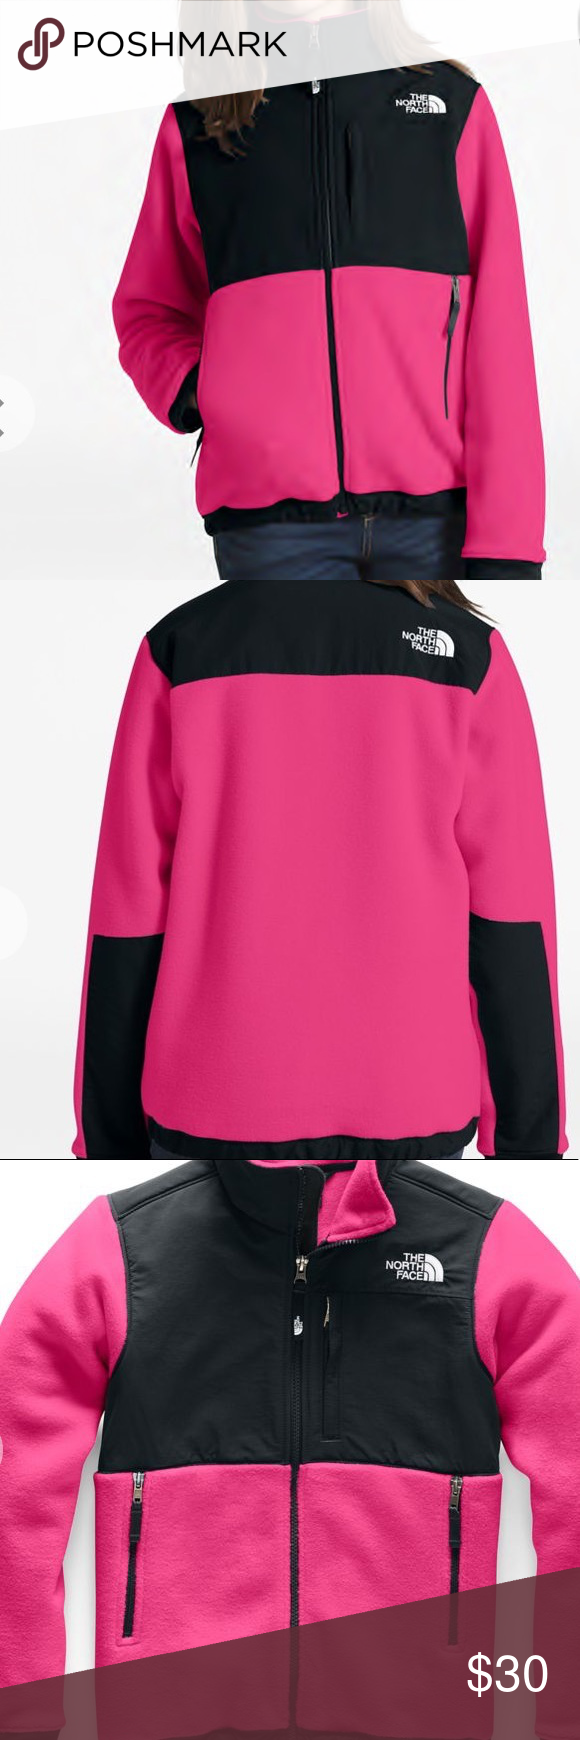 Pink Black Fleece North Face Jacket Pink And Black Fleece North Face Jacket Full Zipper And Three Black Fleece Jacket Black Fleece North Face Fleece Jacket [ 1740 x 580 Pixel ]